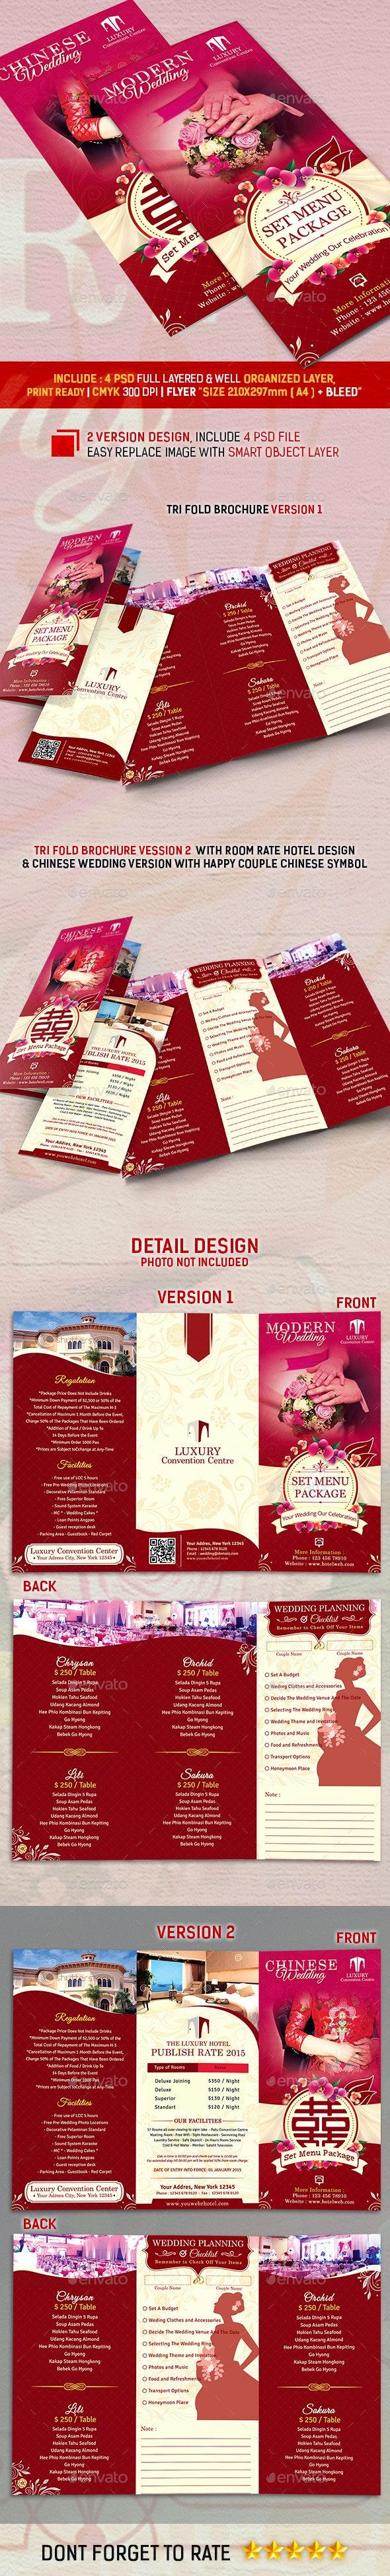 Trifold Wedding Set Menu Package  - Food Menus Print Templates